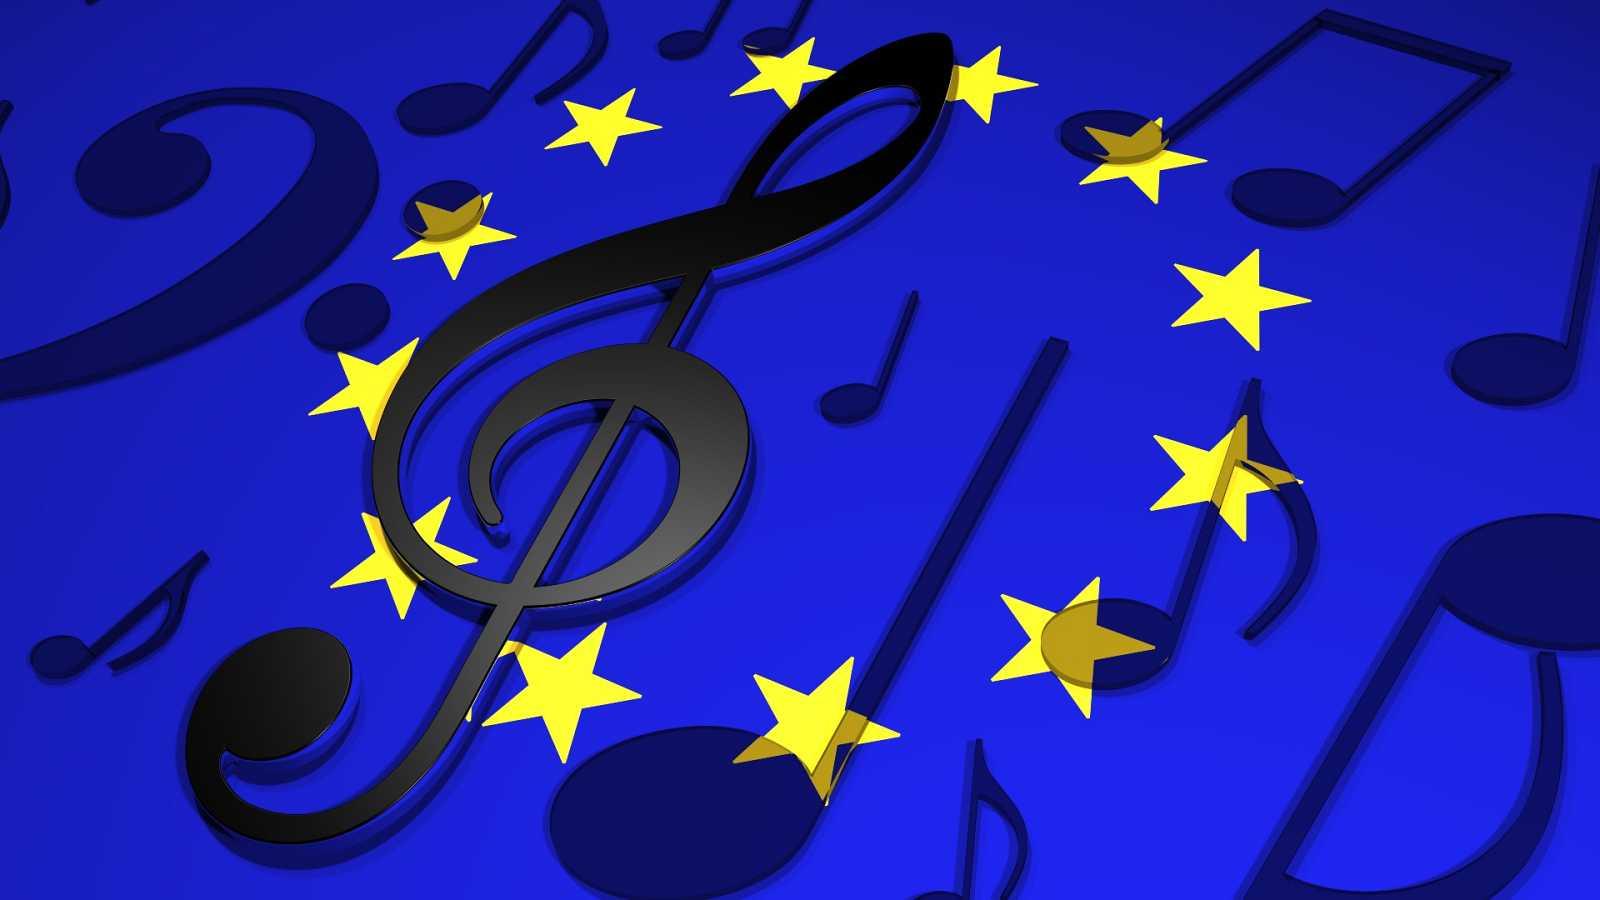 Tarde lo que tarde - Tarde lo que tarde se pone eurovisiva- 14/05/21 - escuchar ahora